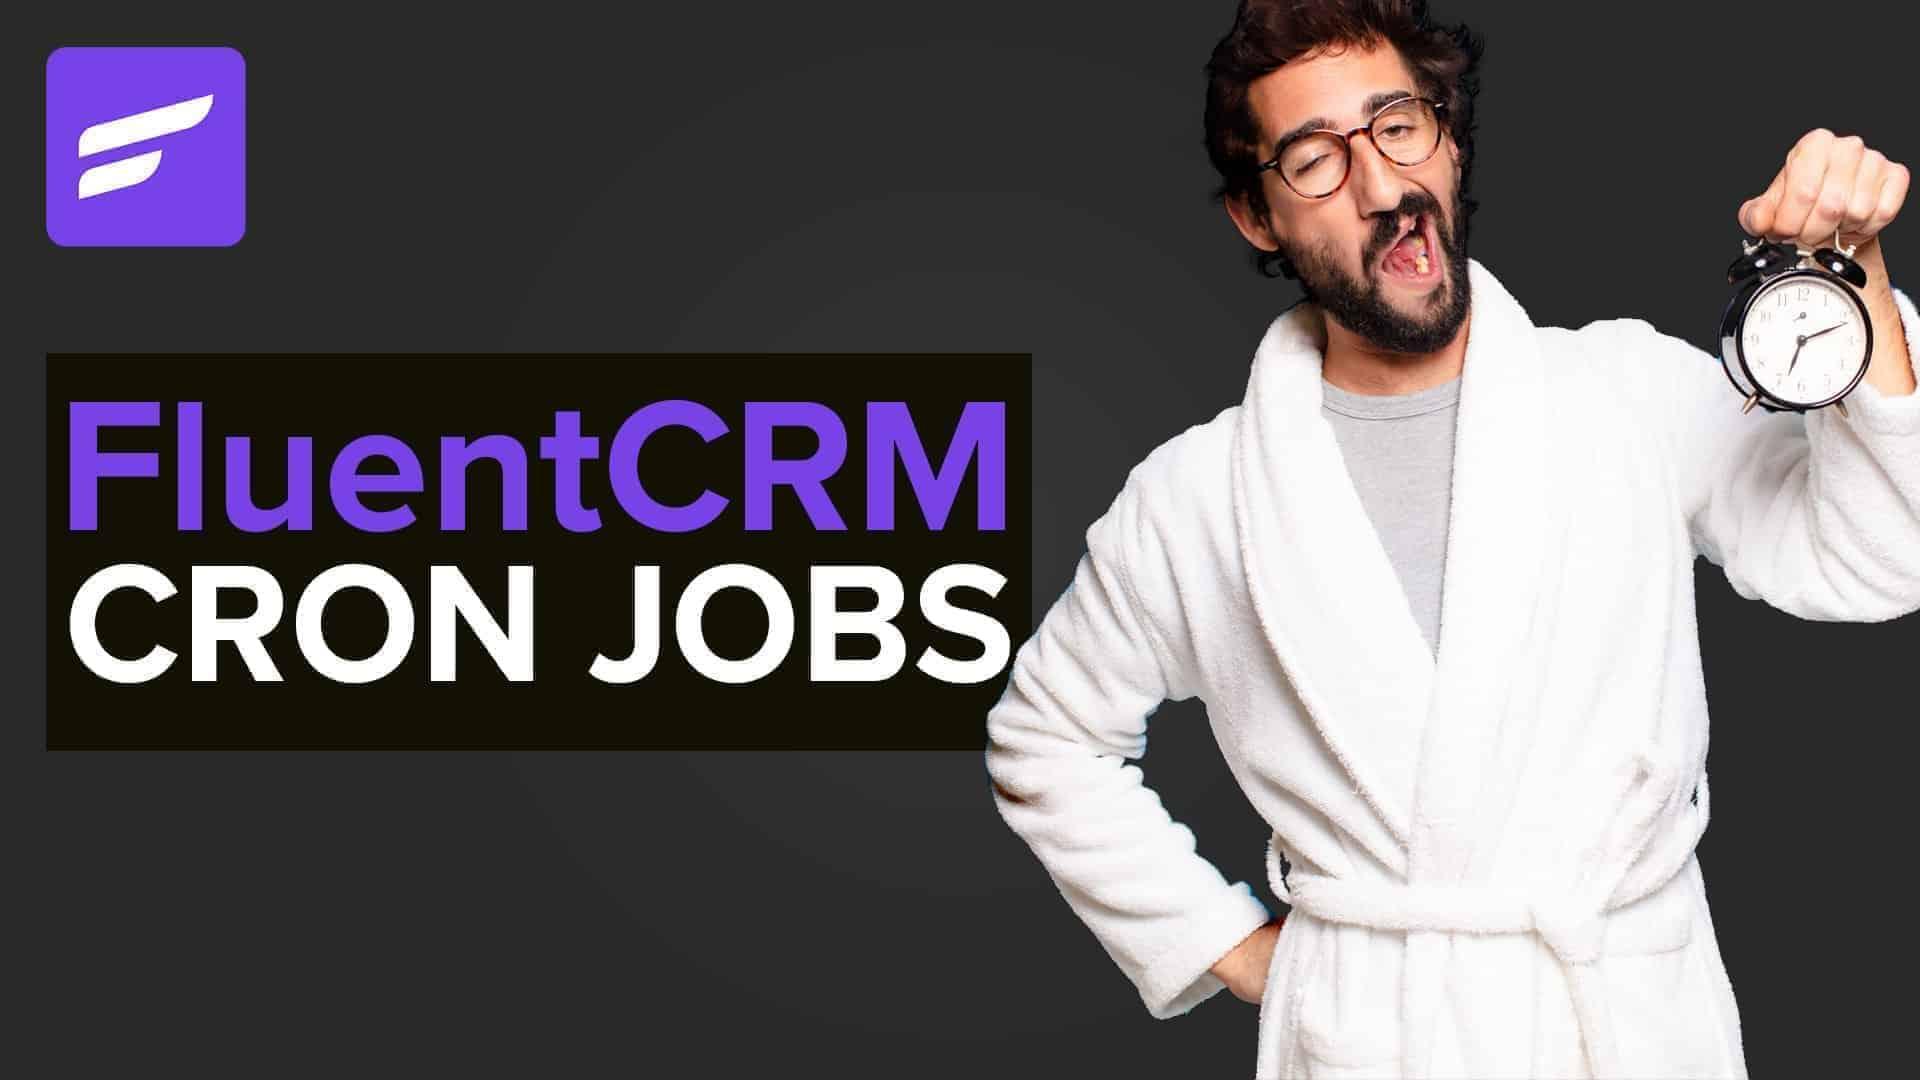 FluentCRM Cron Jobs